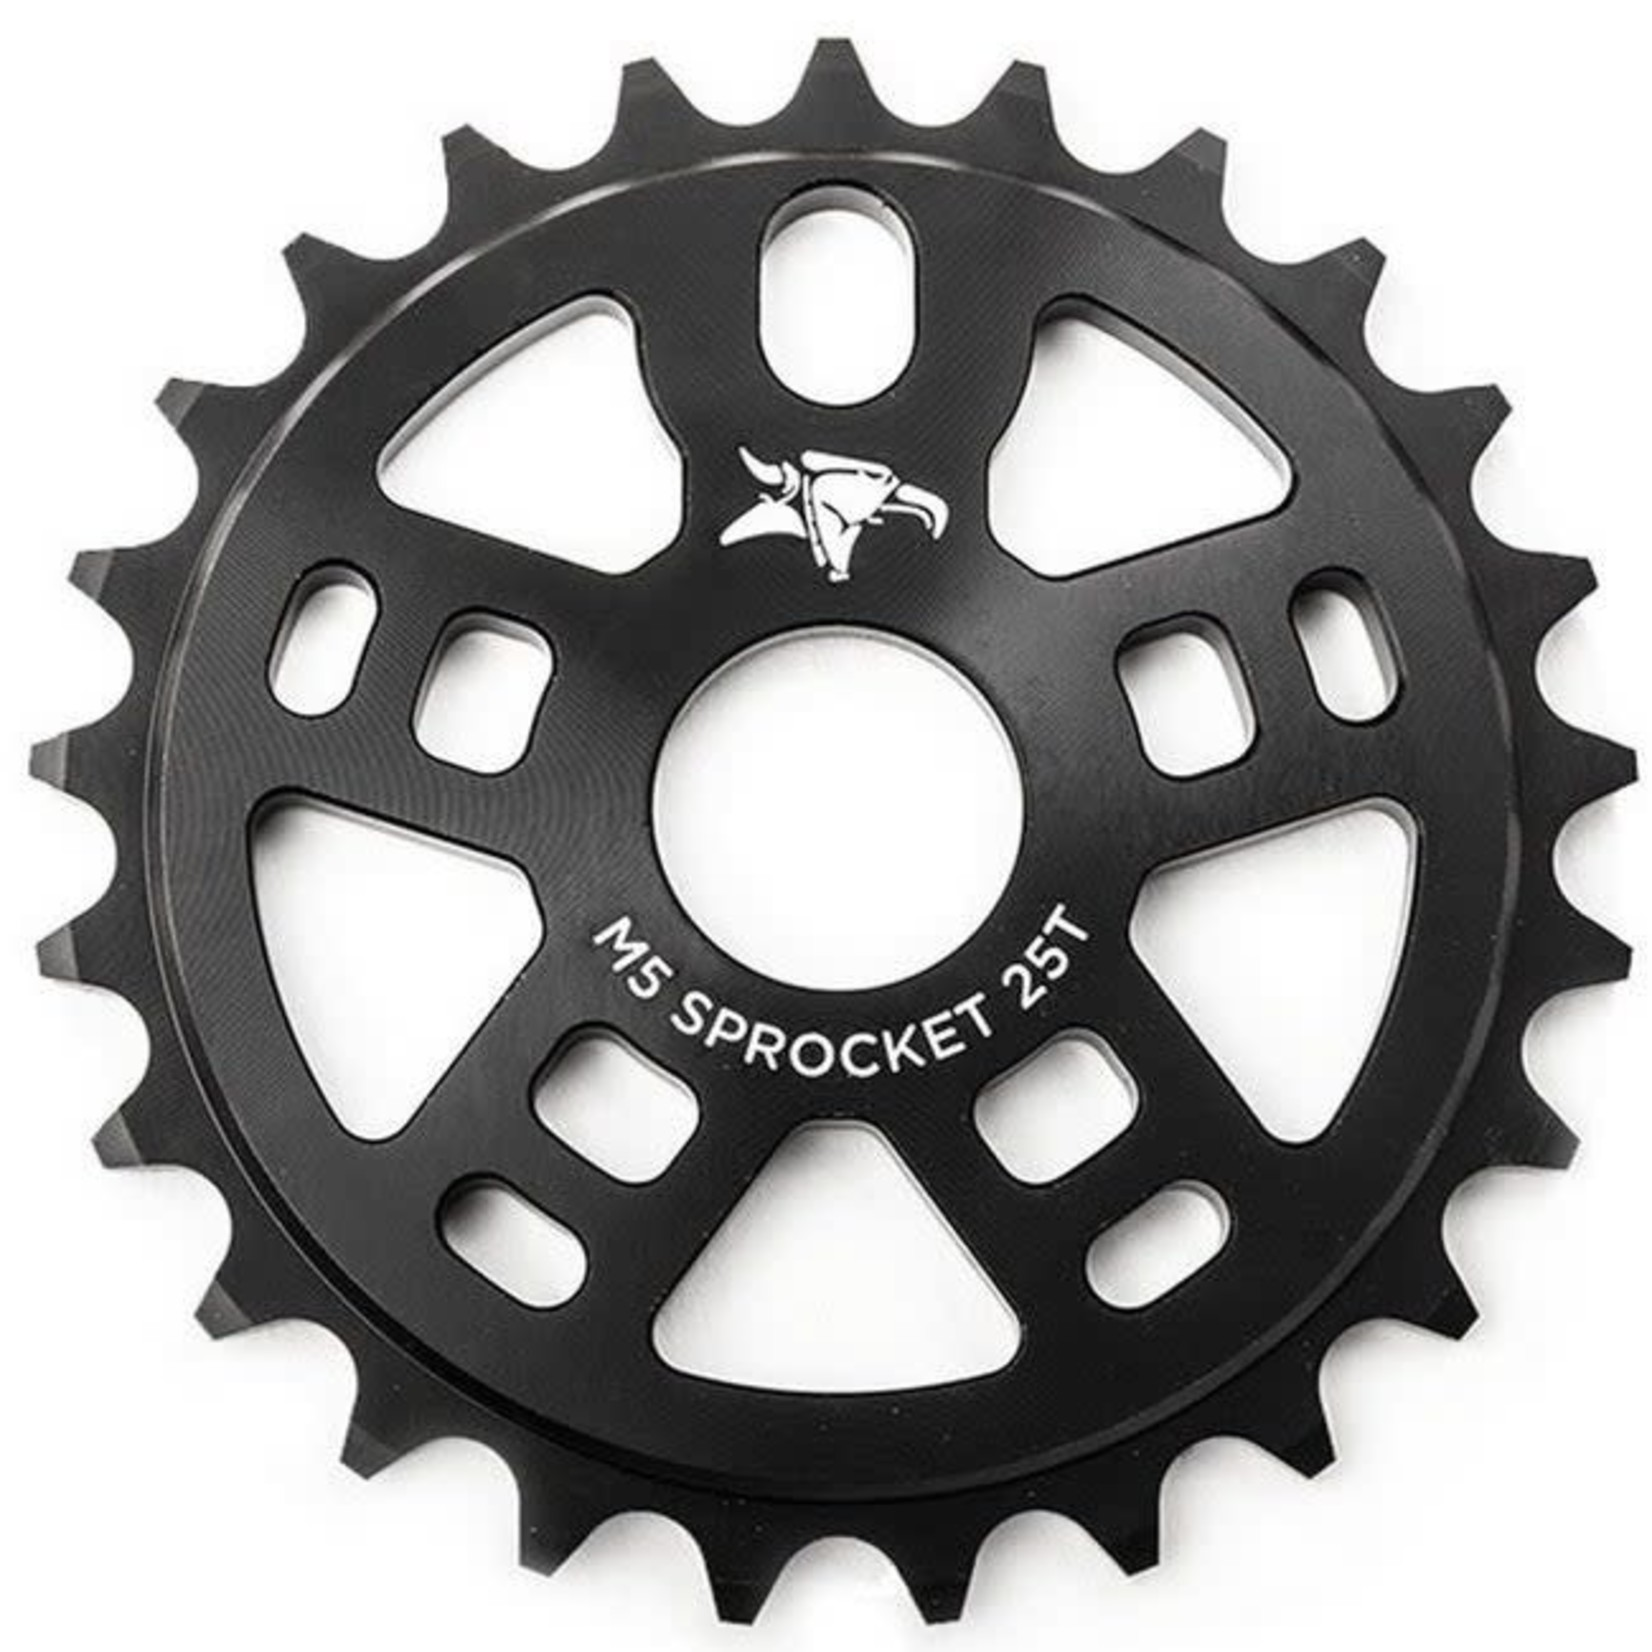 Animal Bikes M5 Sprocket 25T Black